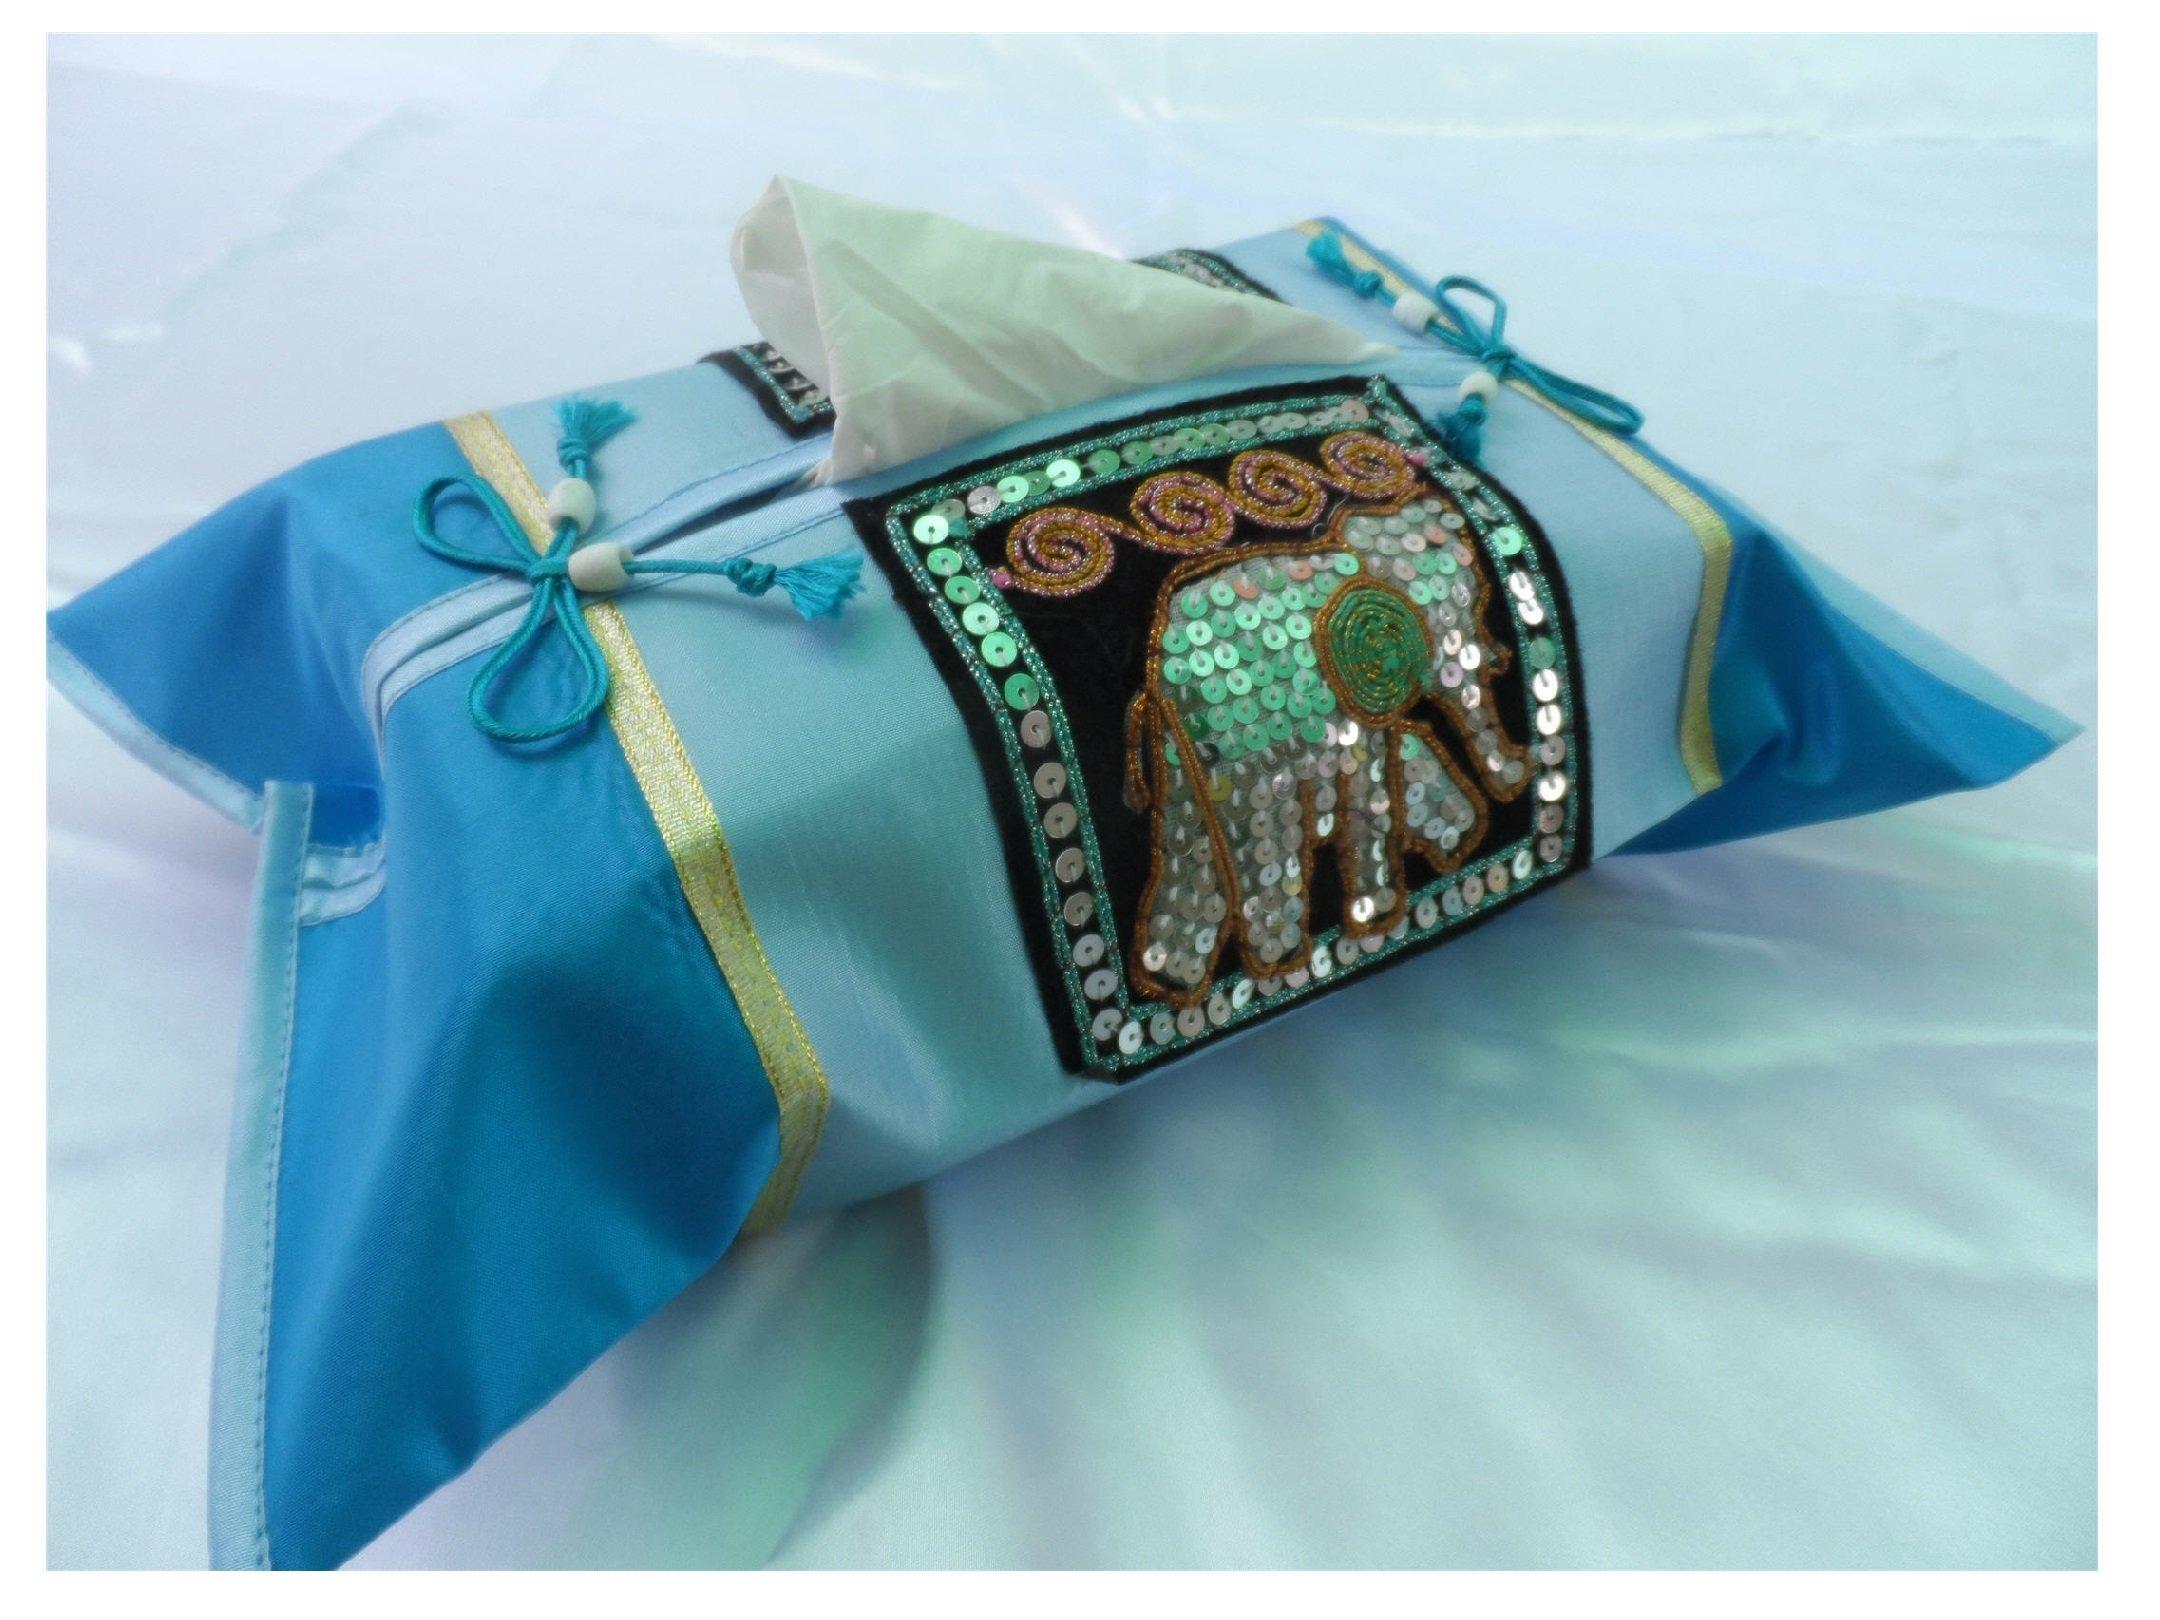 Birthday or Housewarming Christmas Gift Idea - Thai Silk Tissue Box Cover Holder (Blue) with Elephant - Thai Silk/Standard Size